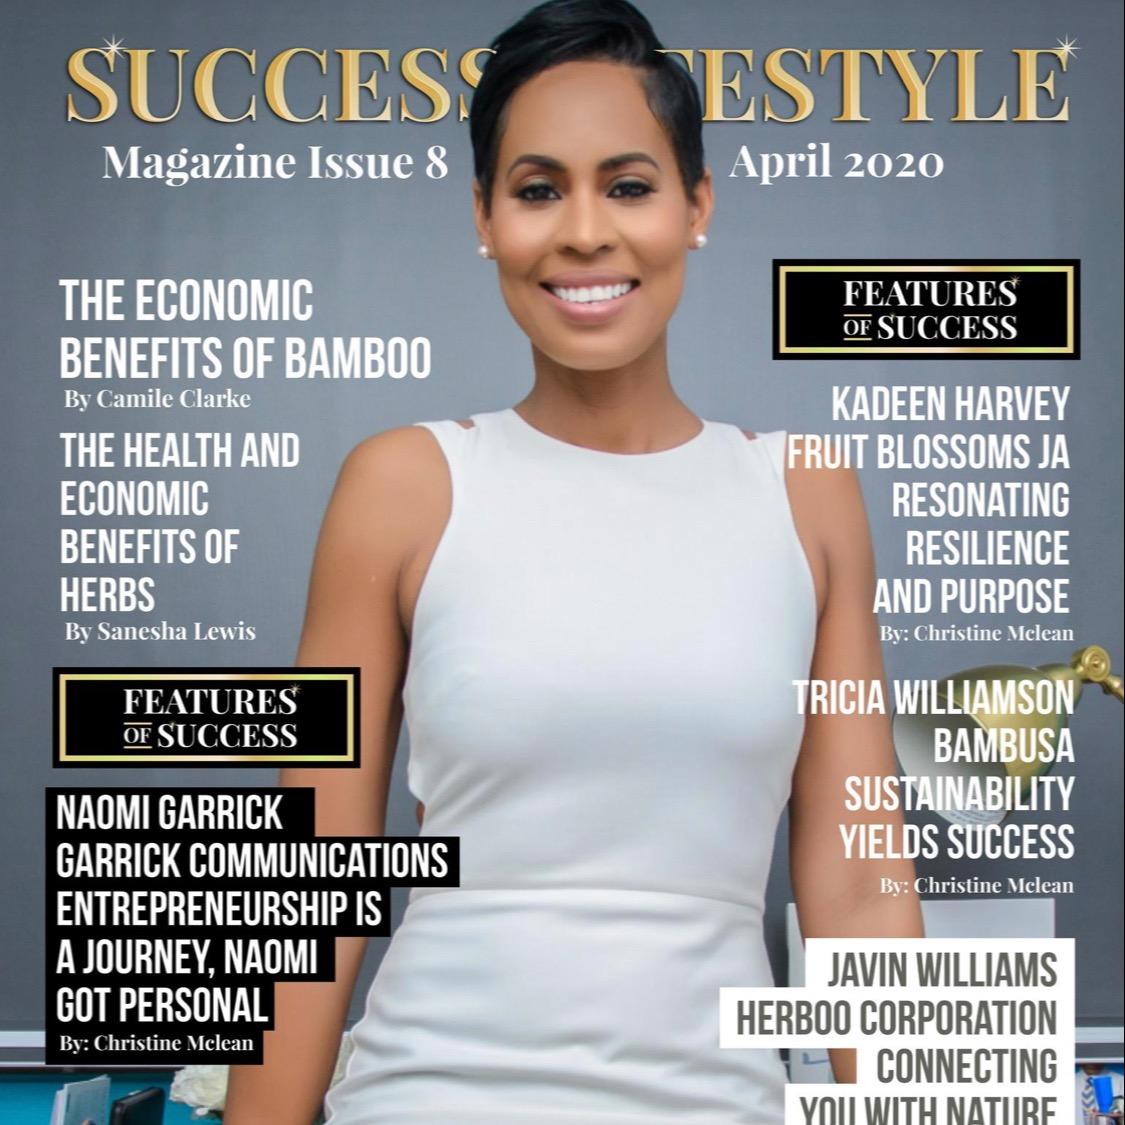 Success Lifestyle Article: Entrepreneurship Is A Journey